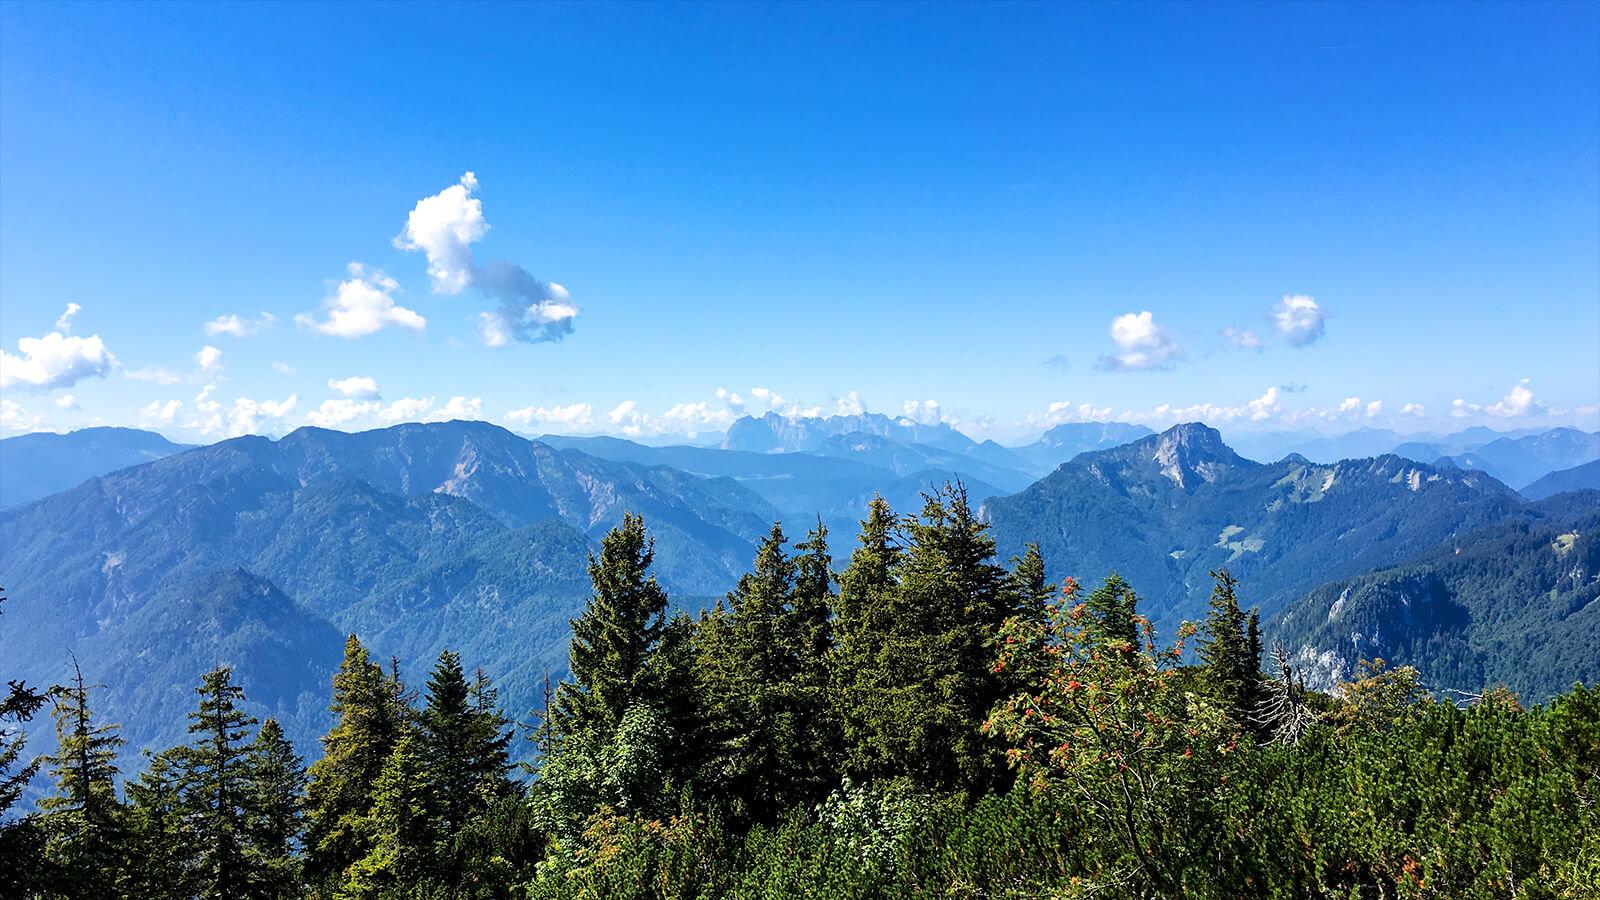 Unsere Outdoor & Trekking Touren